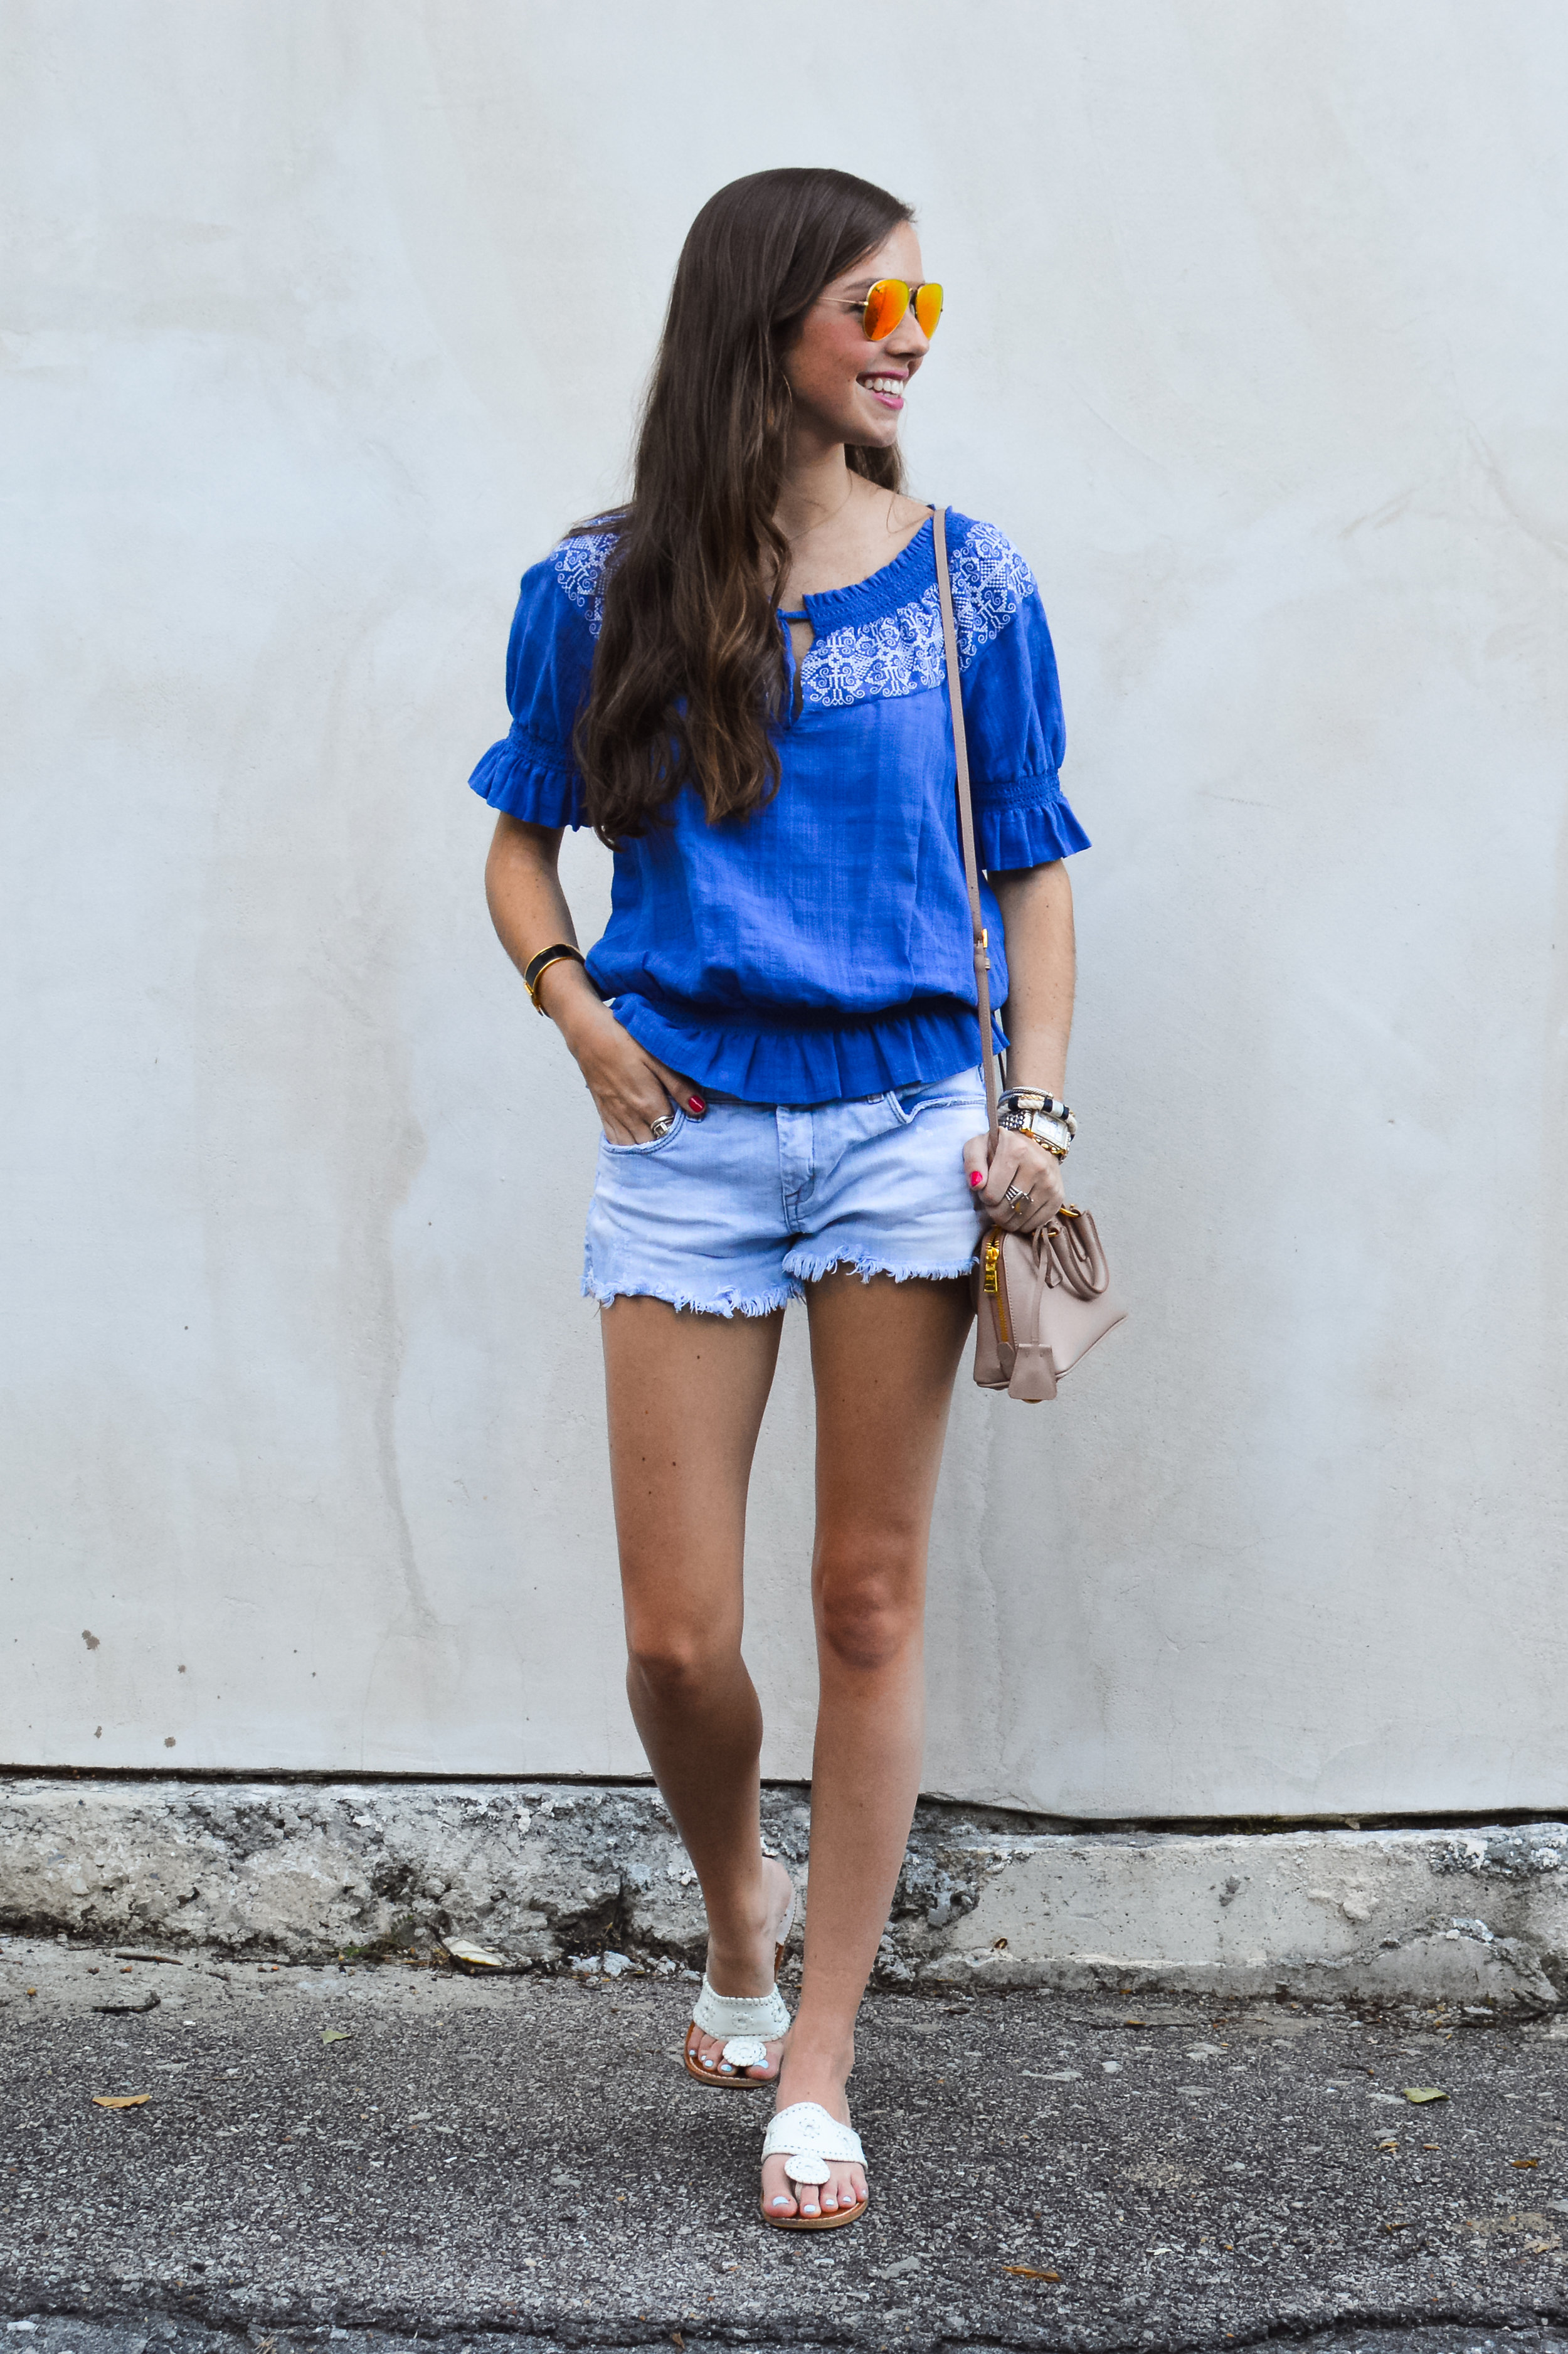 lcb_style_fashion_blogger_fourth of july (2 of 4).jpg